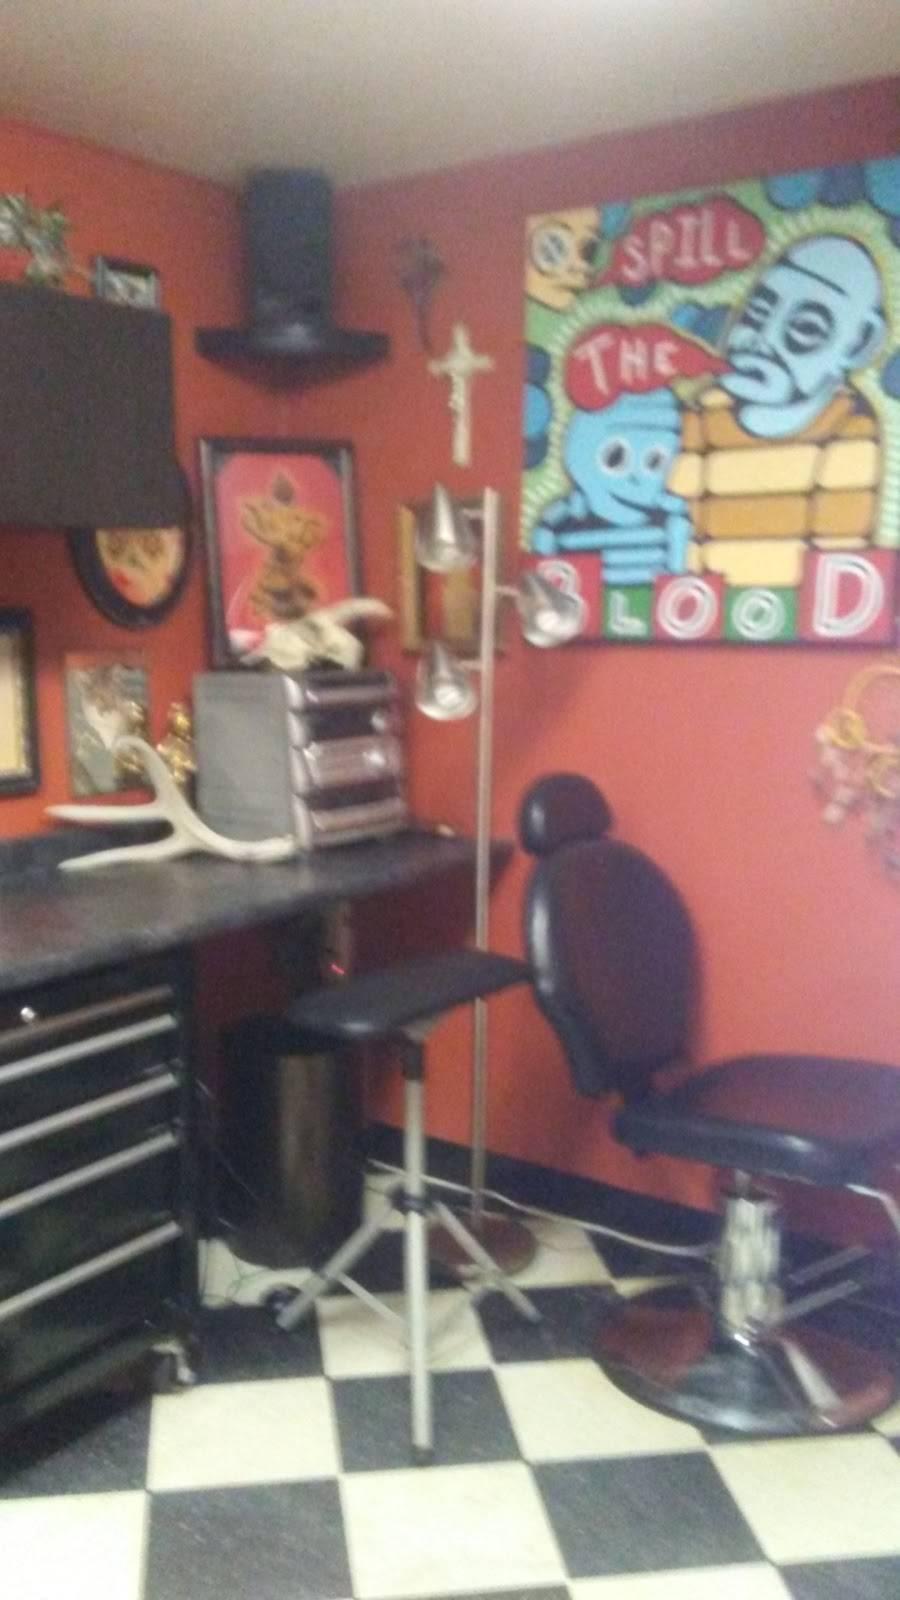 Staygold Tattoo - store  | Photo 4 of 5 | Address: 1207 4th Ave, Coraopolis, PA 15108, USA | Phone: (412) 264-5479